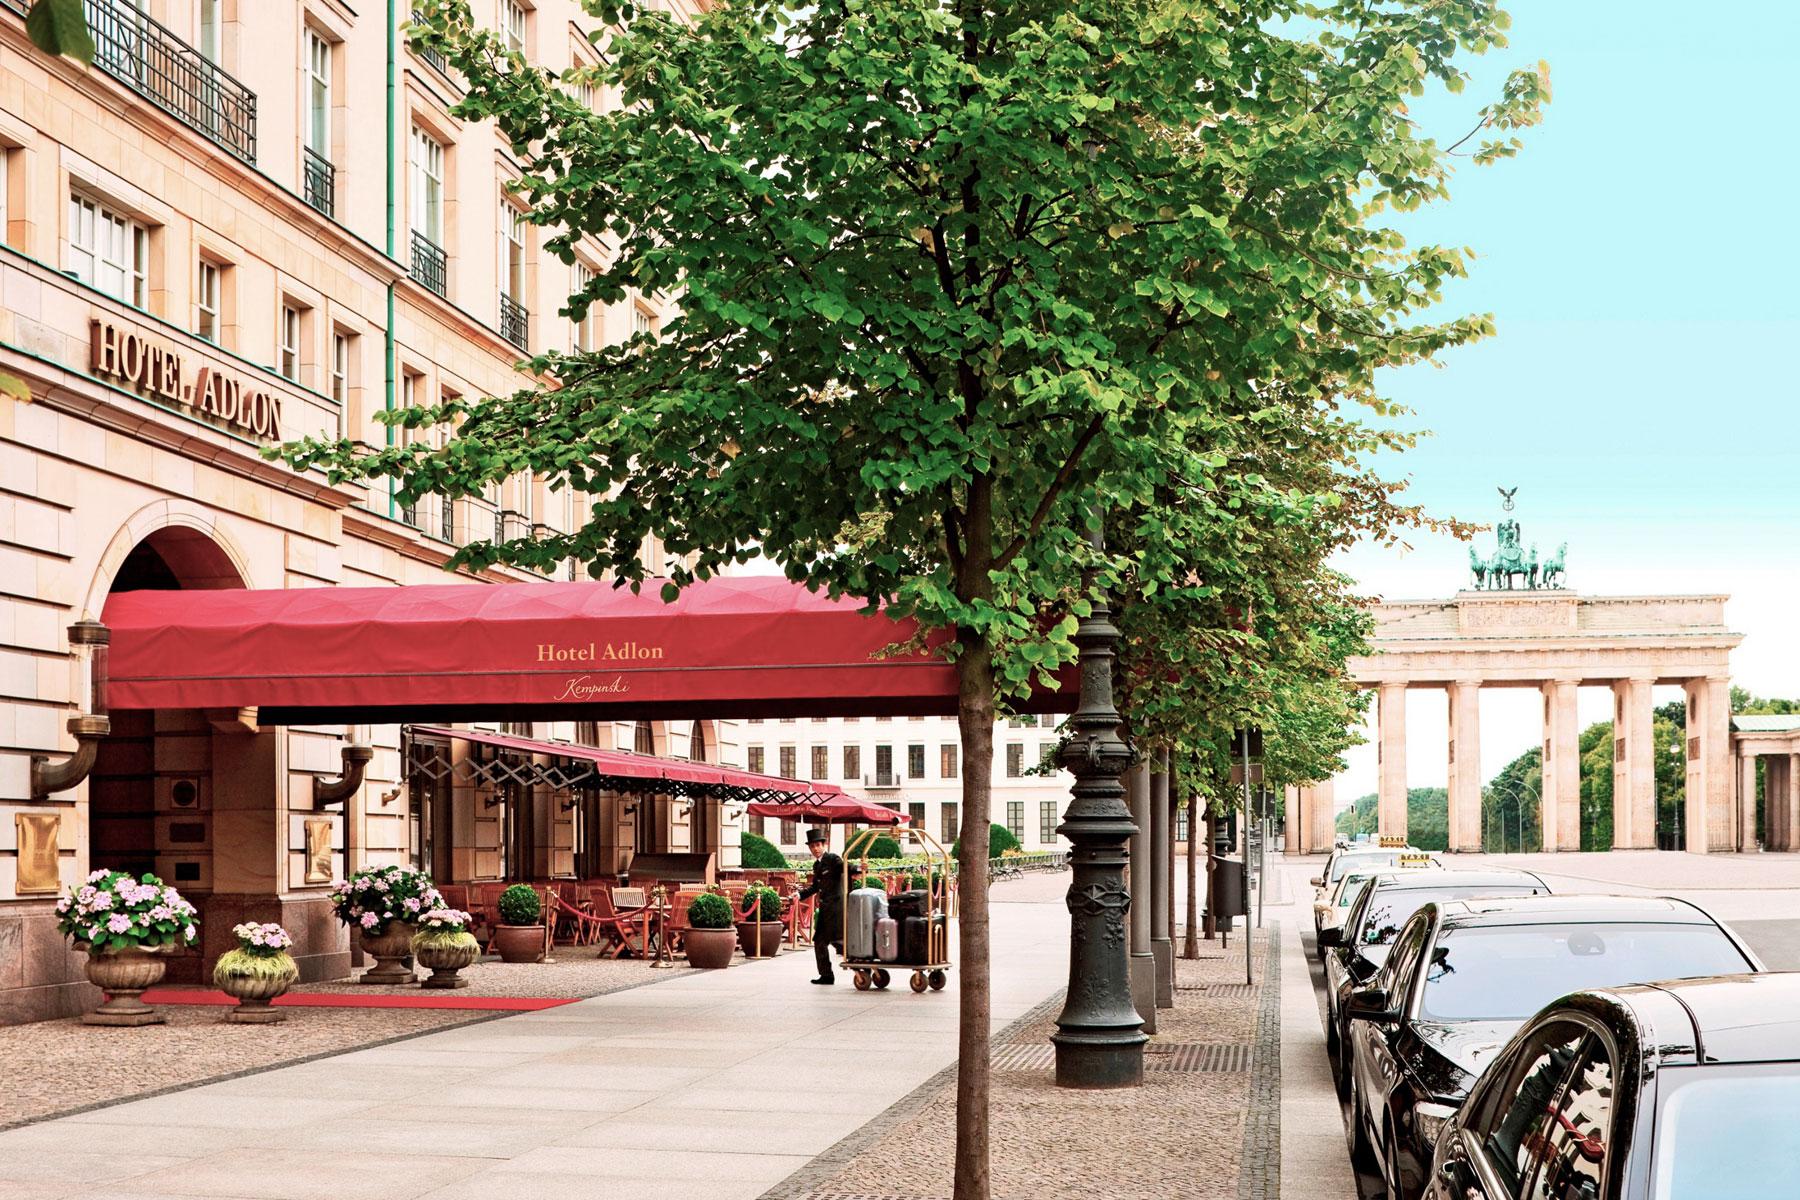 Adlon Kempinski Hotel